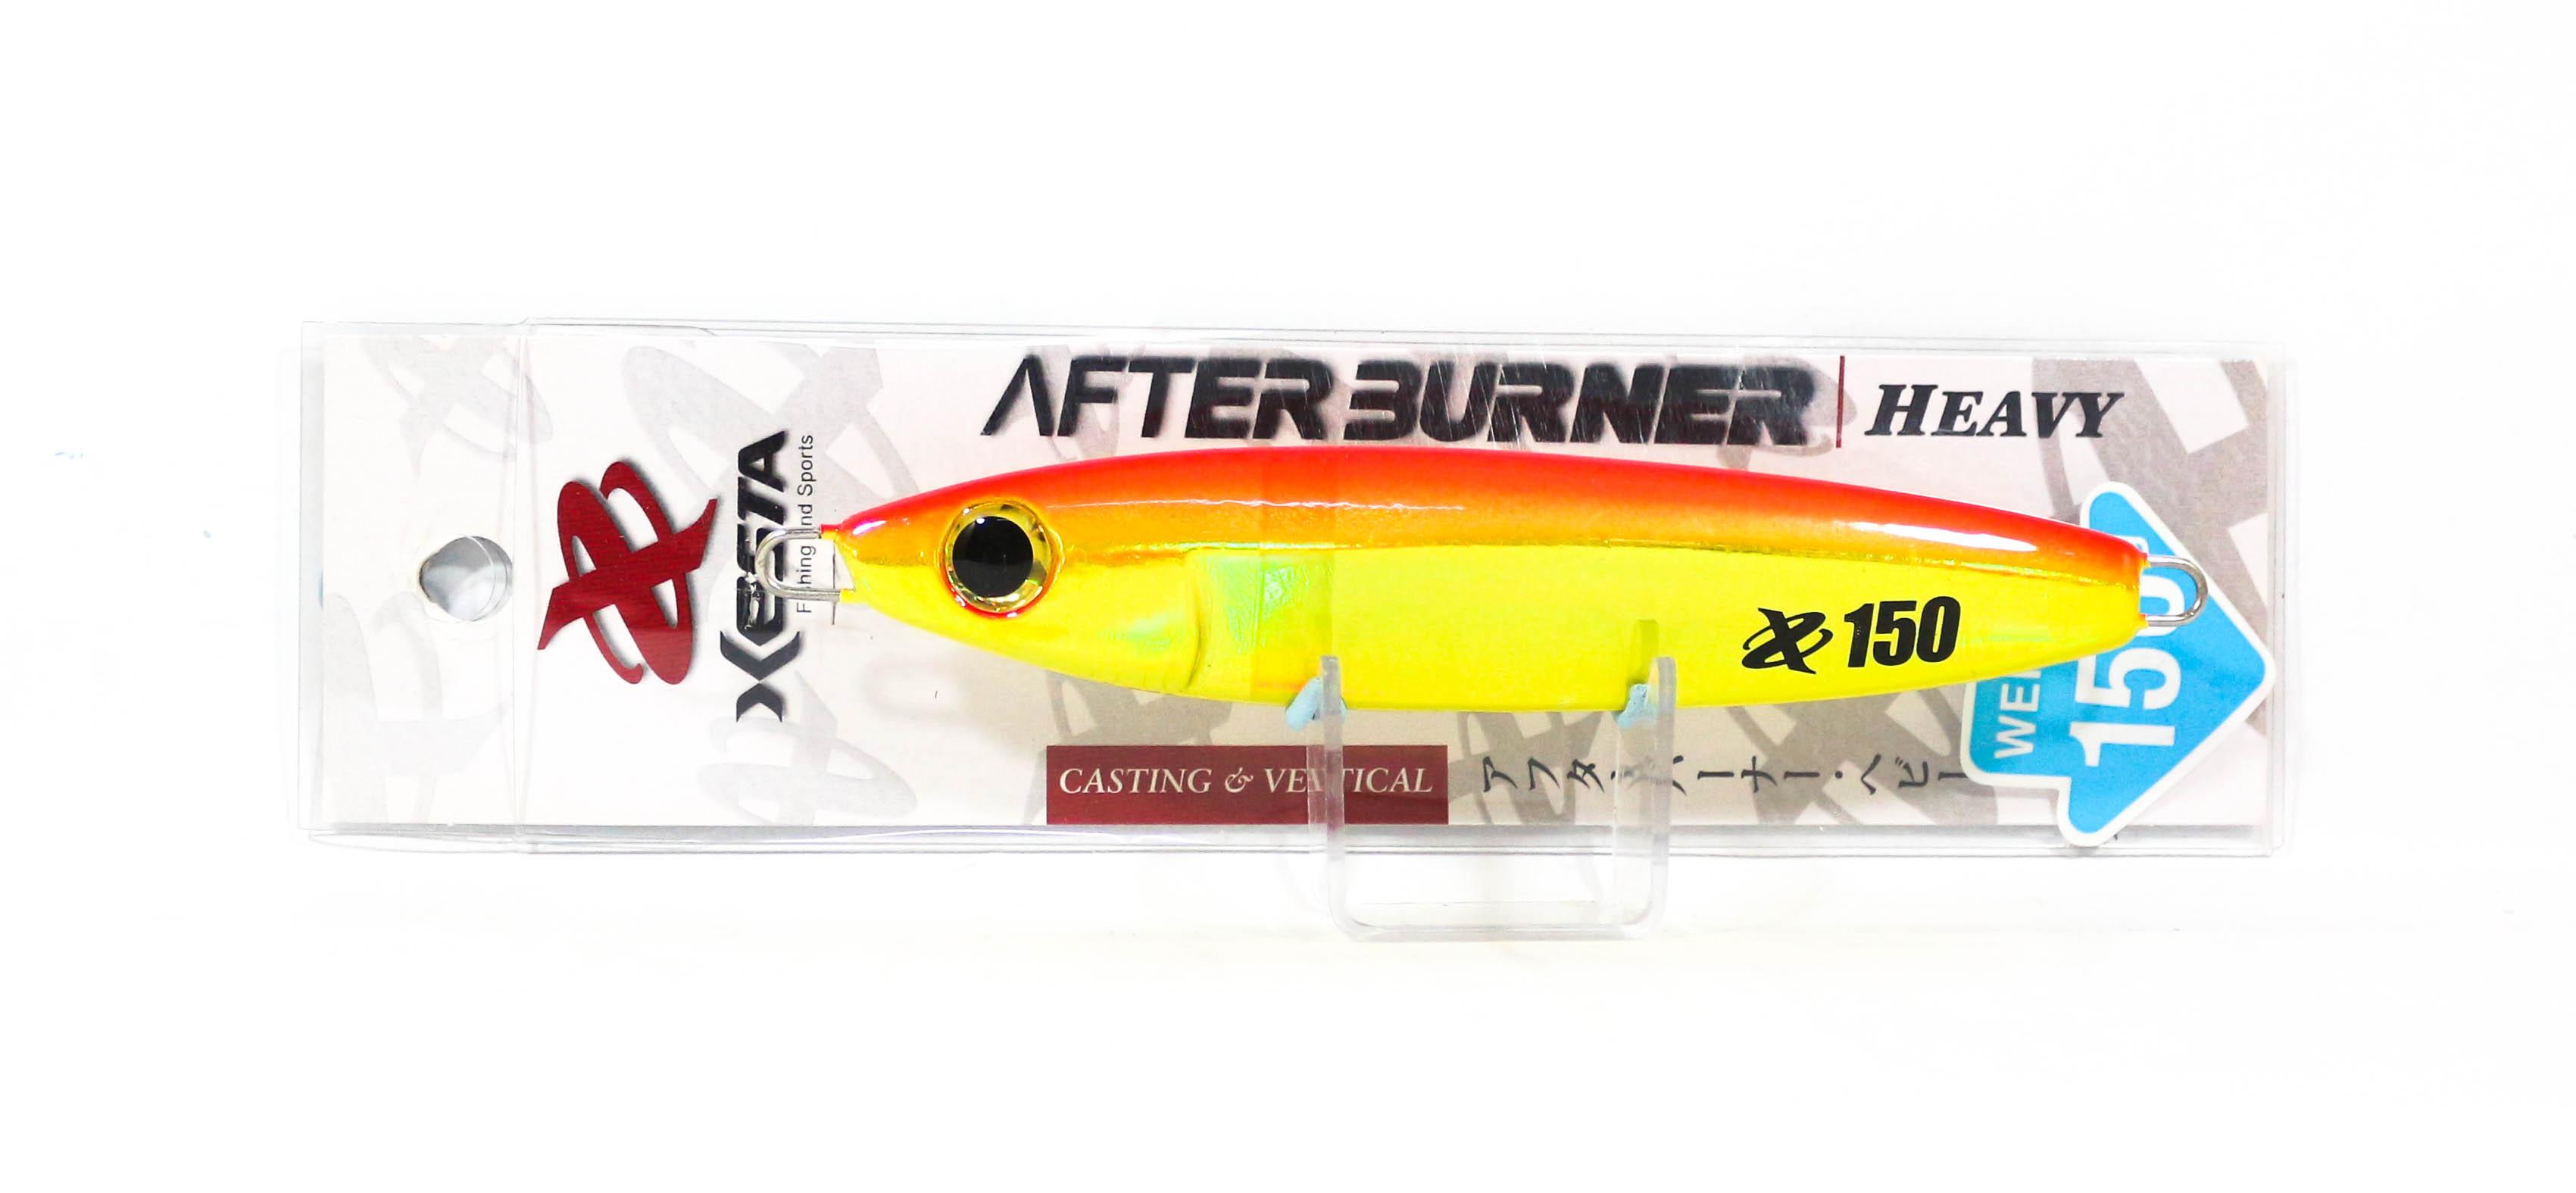 Sale Xesta Metal Jig After Burner 150 grams OGD (9740)